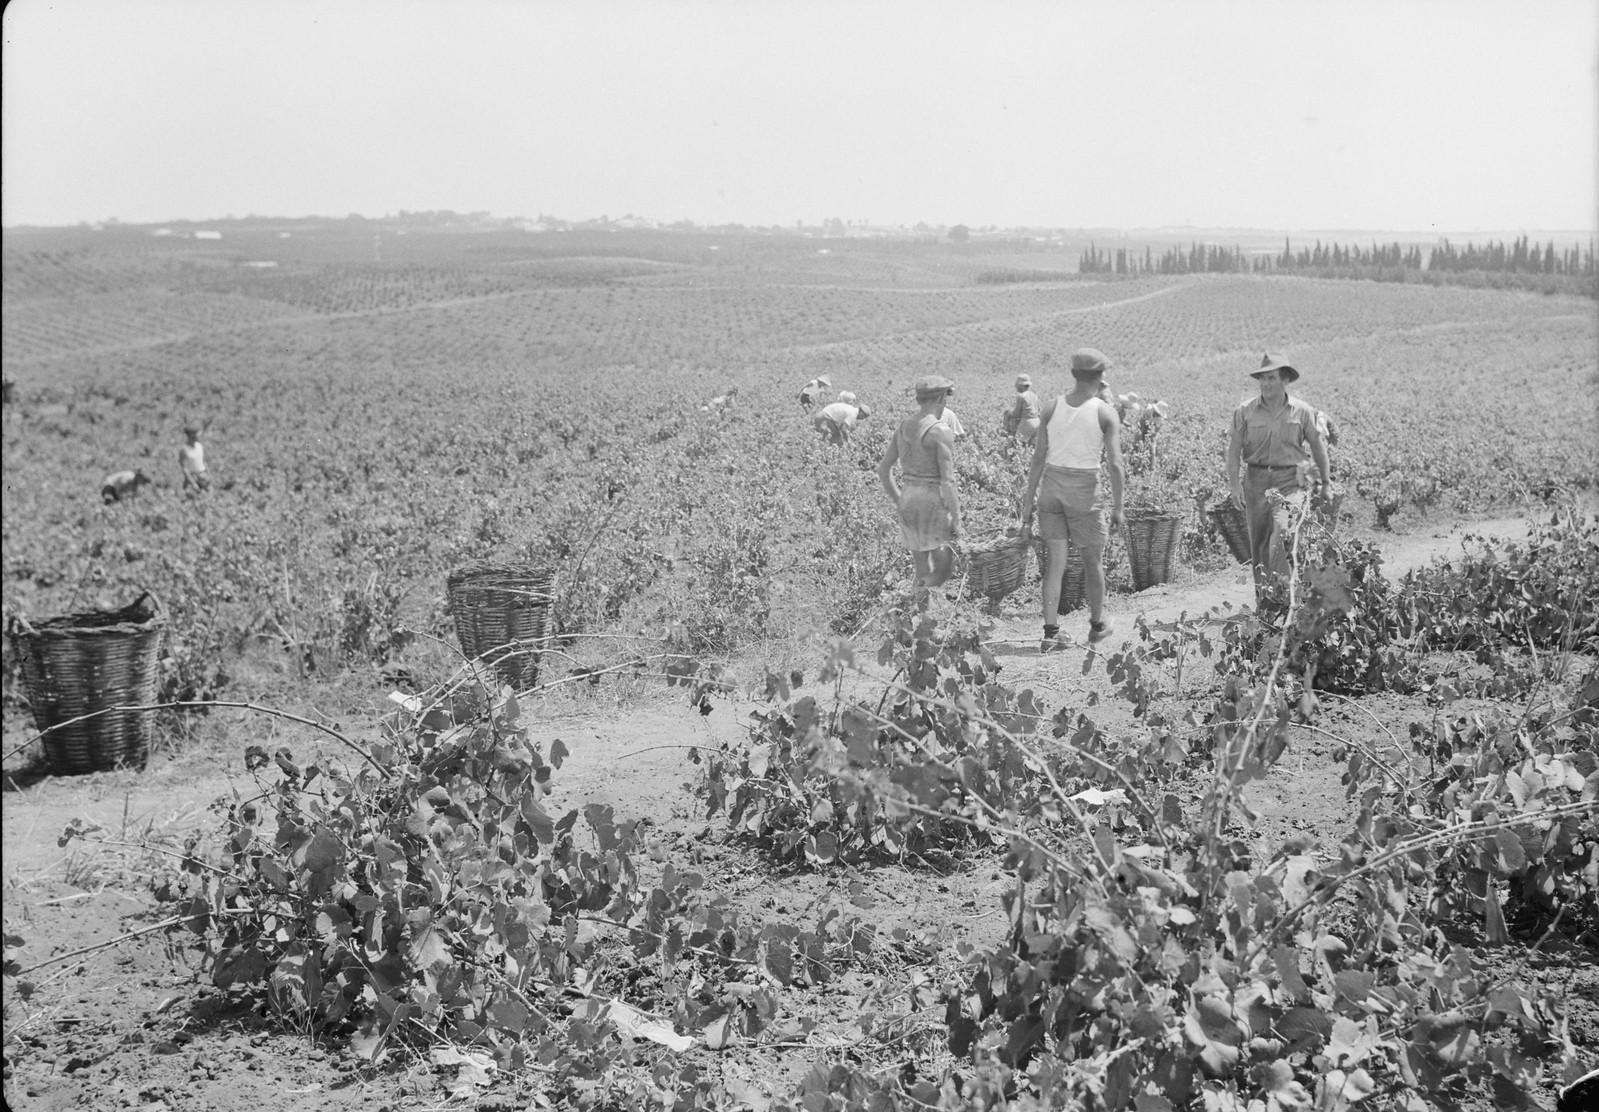 18. Общий вид виноградников во время сбора винограда